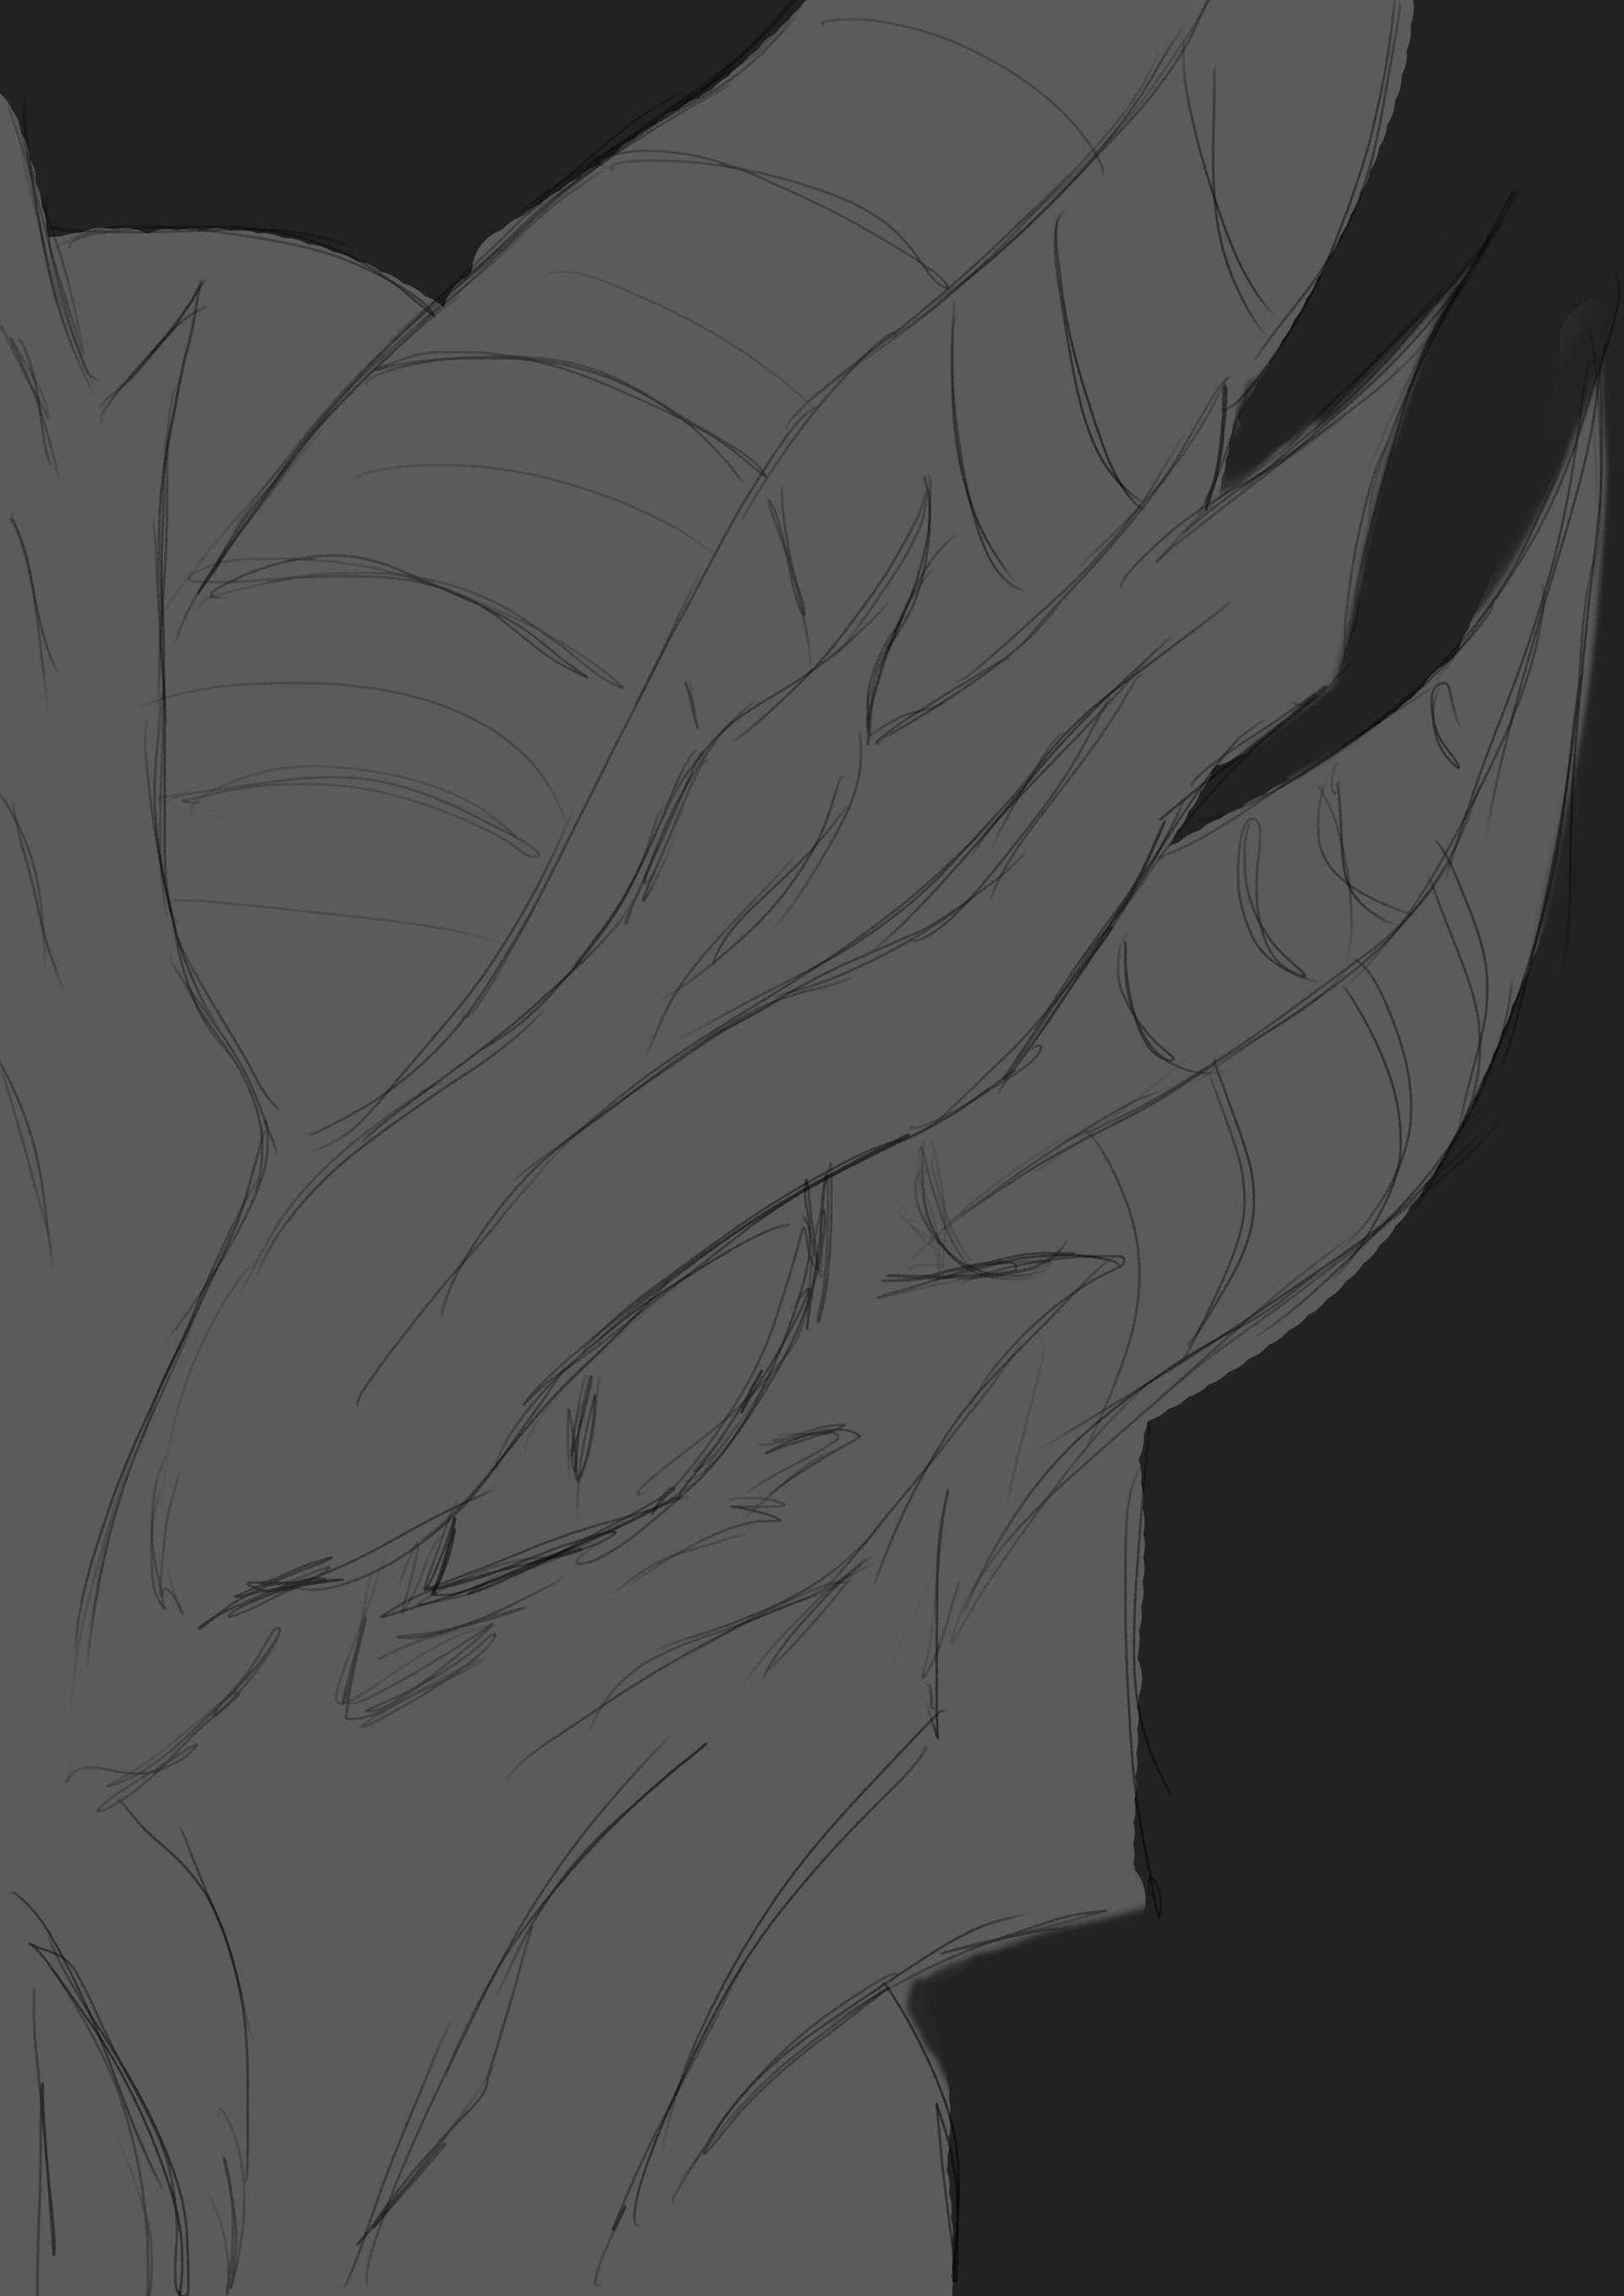 Digi nana demon2